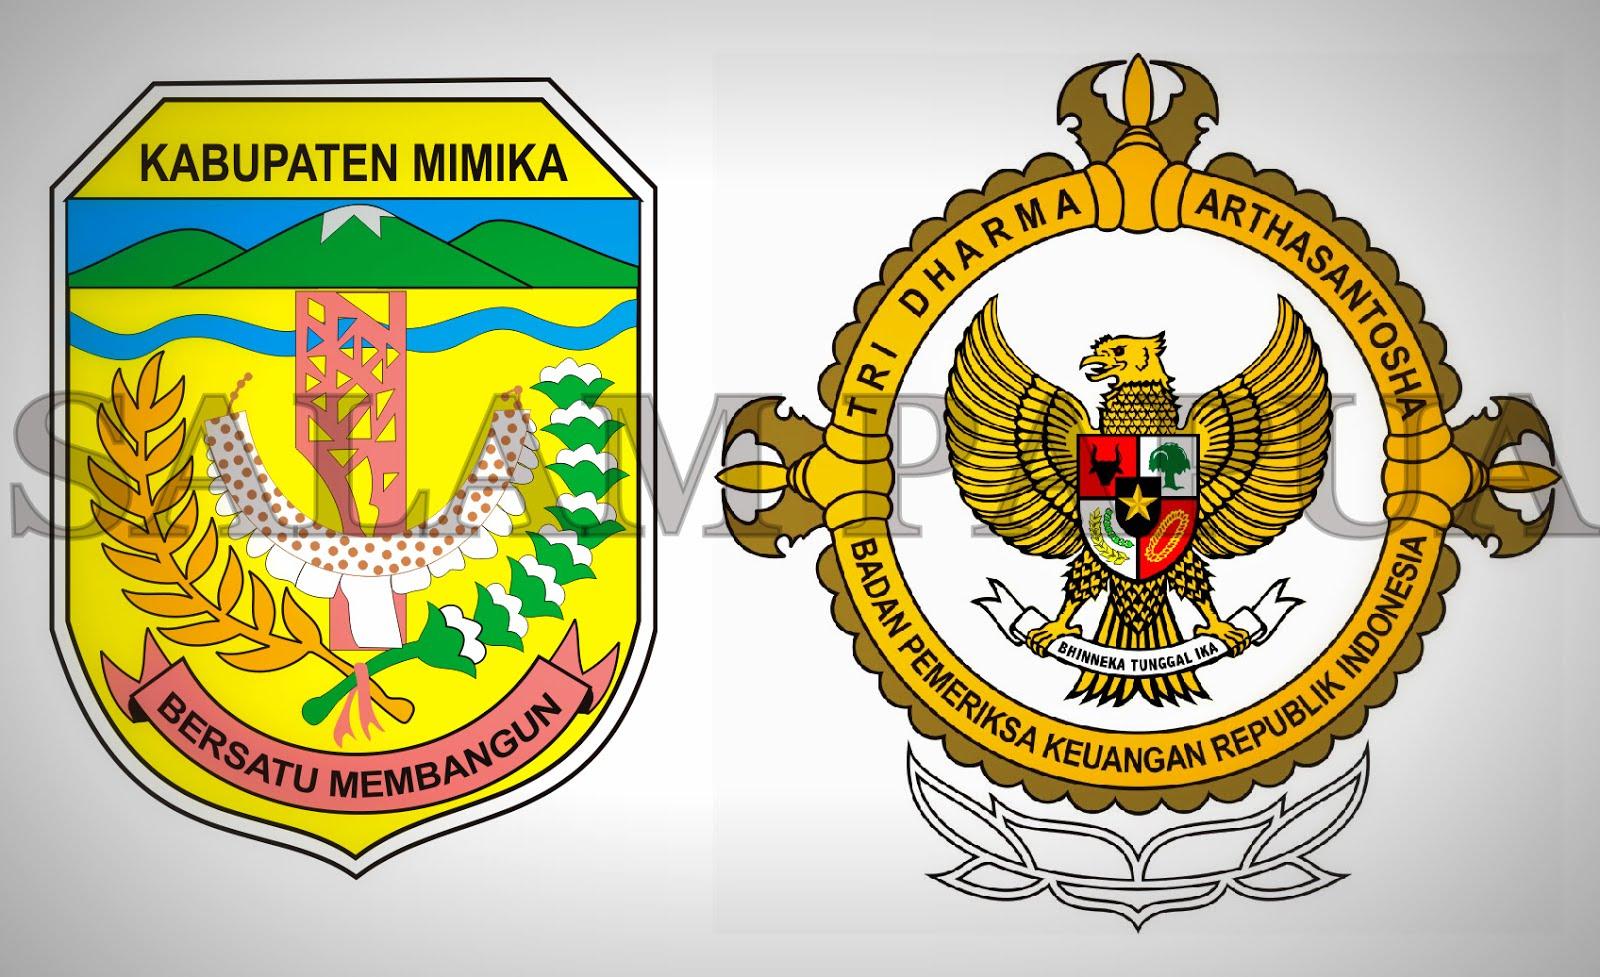 Terkait Laporan Keuangan Pemda Dprd Mimika Akan Panggil Bpk Salam Papua